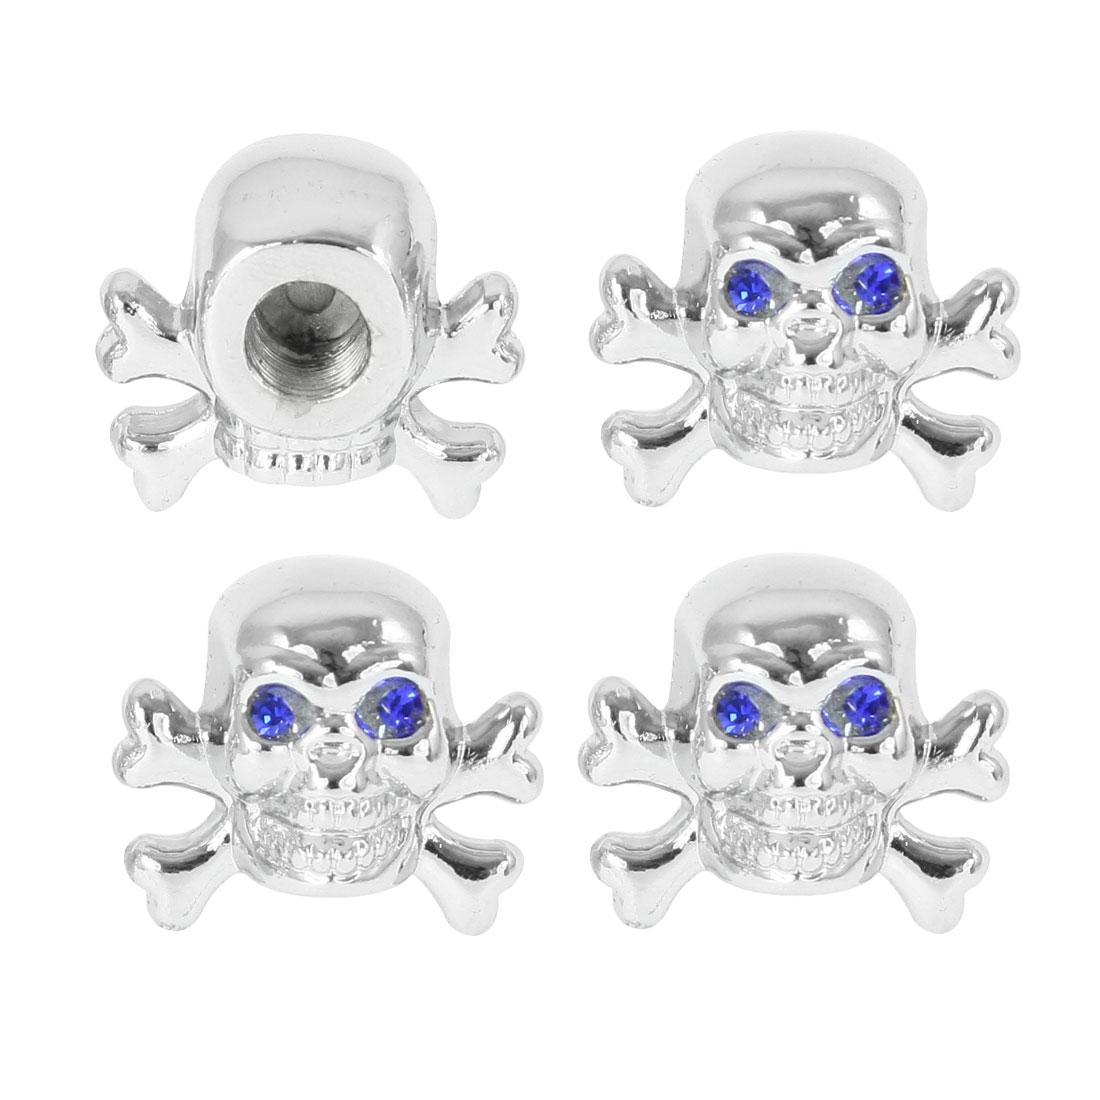 4 Pcs Blue Eyes Skull Car Auto Tyre Valve Dust Caps Stem Covers Silver Tone